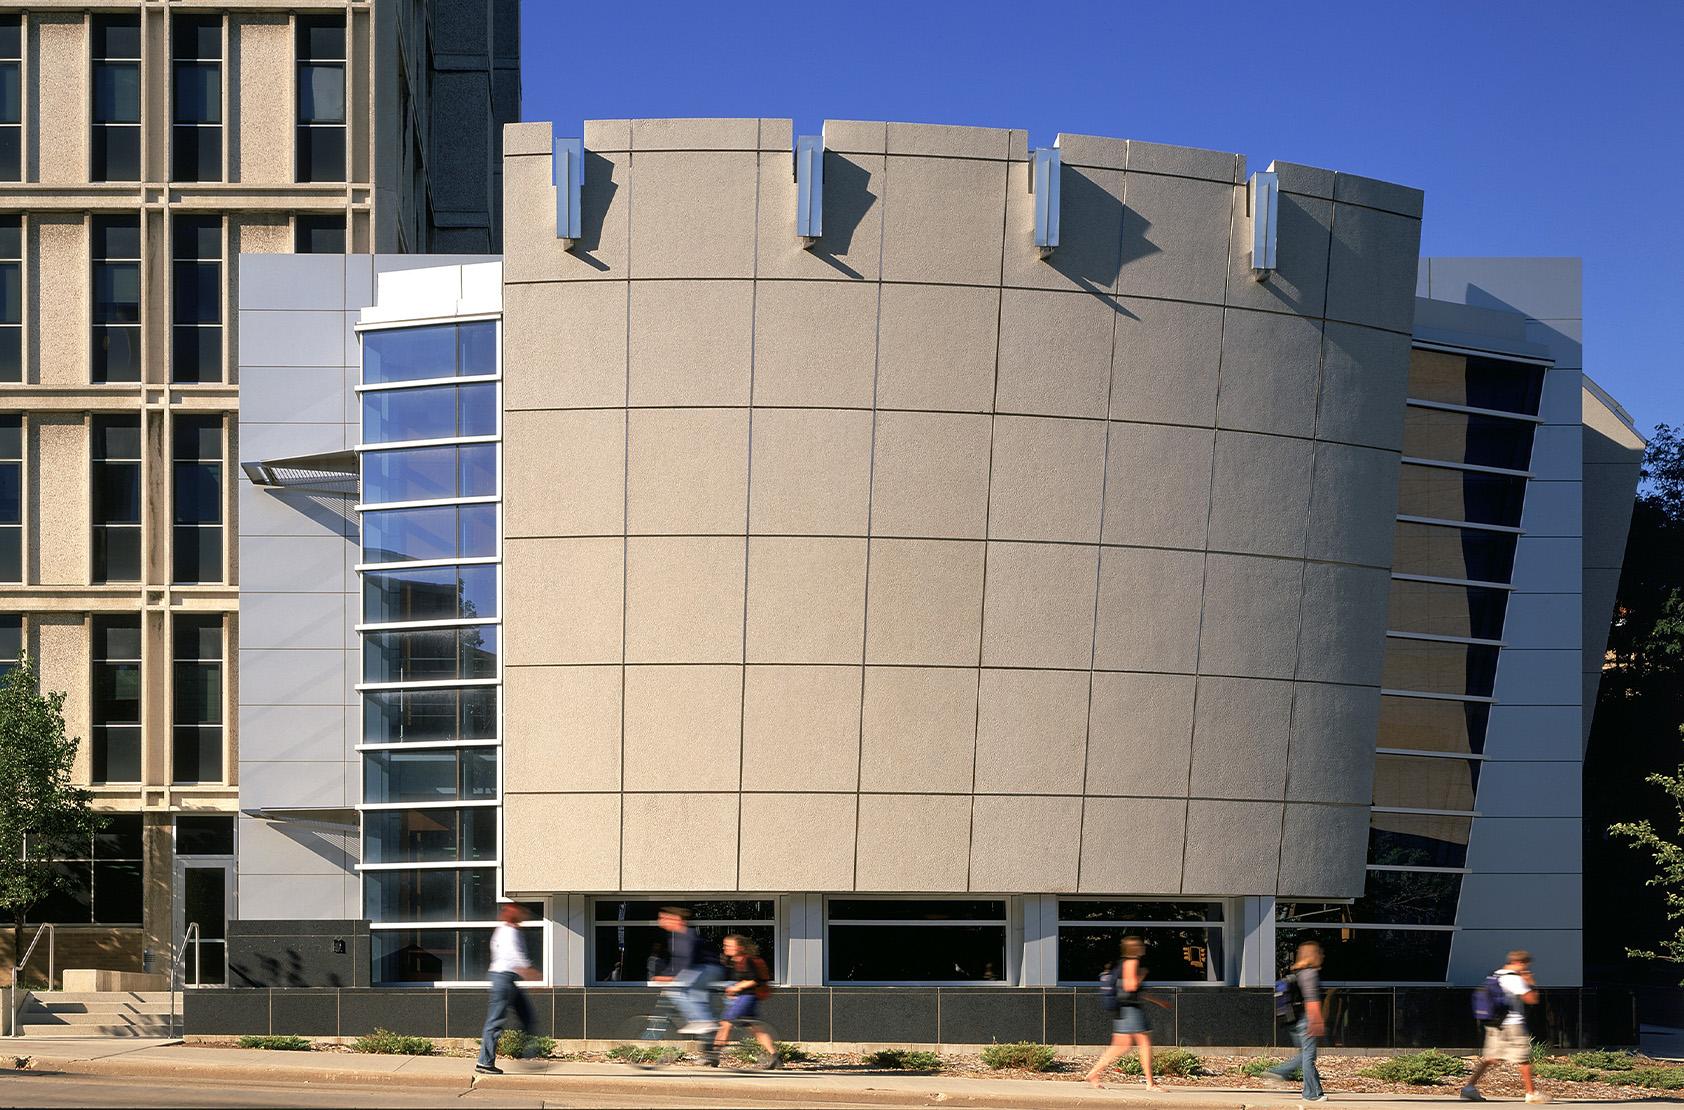 University of Wisconsin, Madison - Chemistry Building